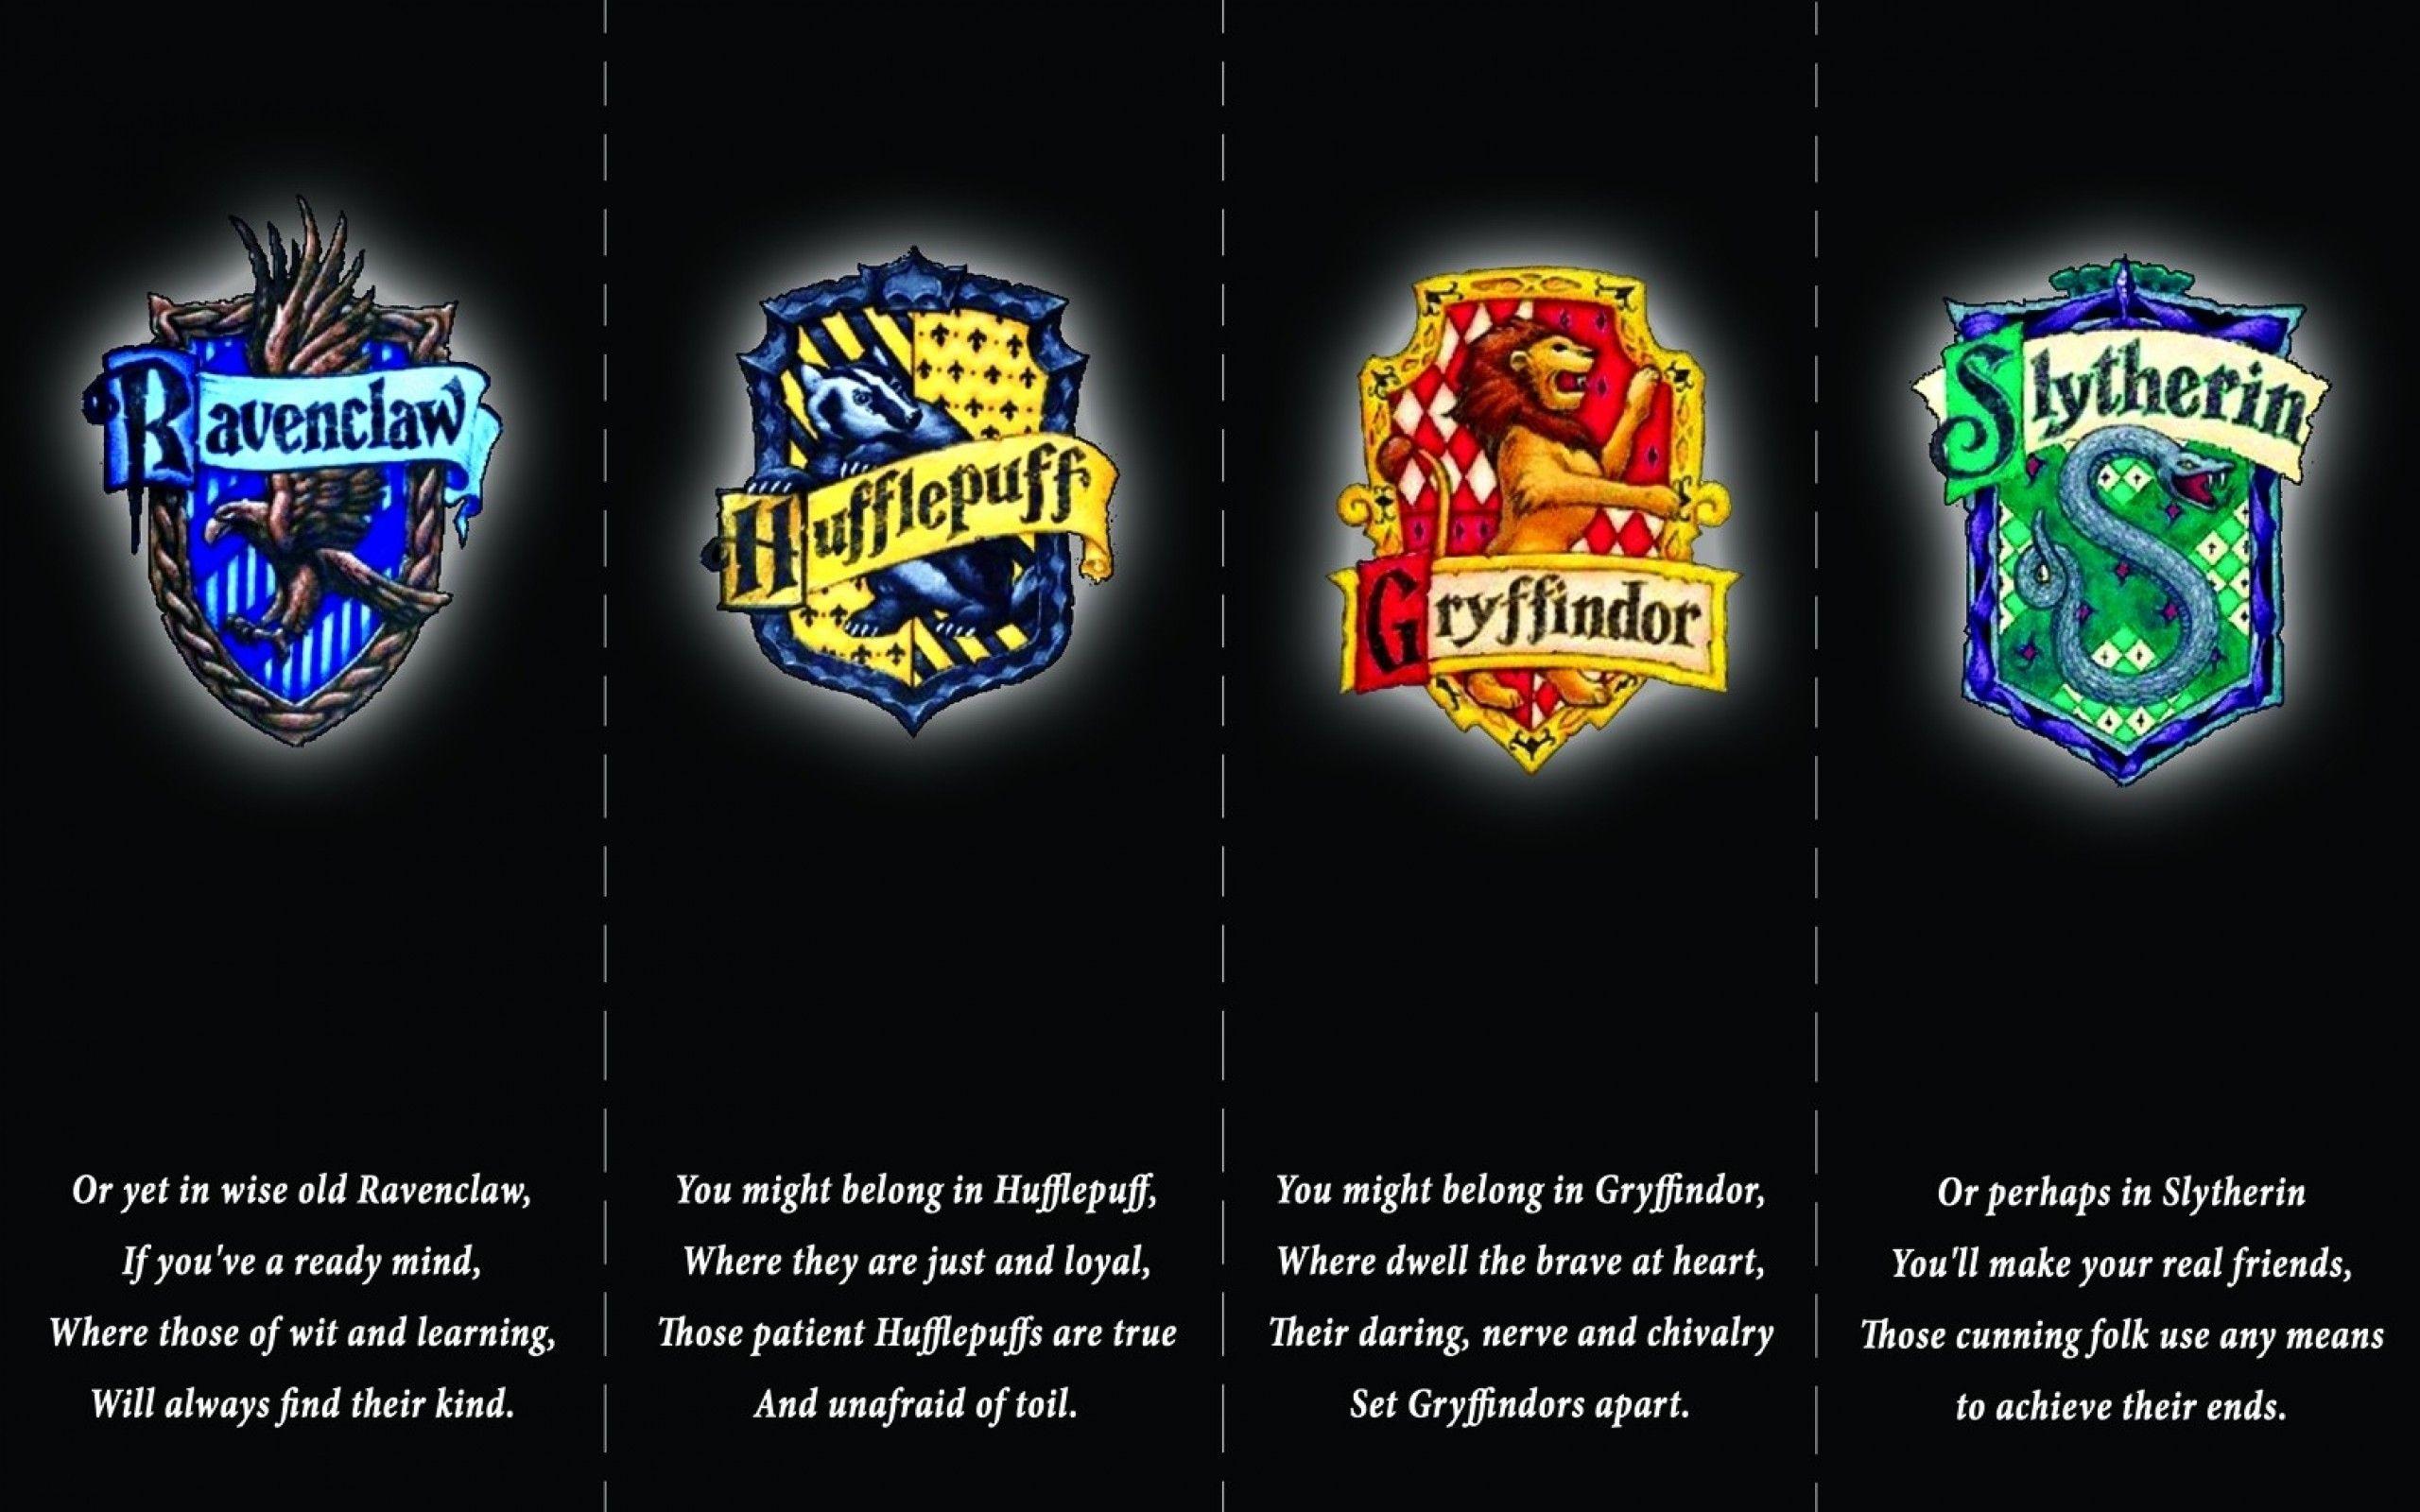 Ravenclaw Desktop Wallpaper 2560x1600 Ipad Retina Harry Potter Bookmark Harry Potter Gryffindor Harry Potter Hogwarts